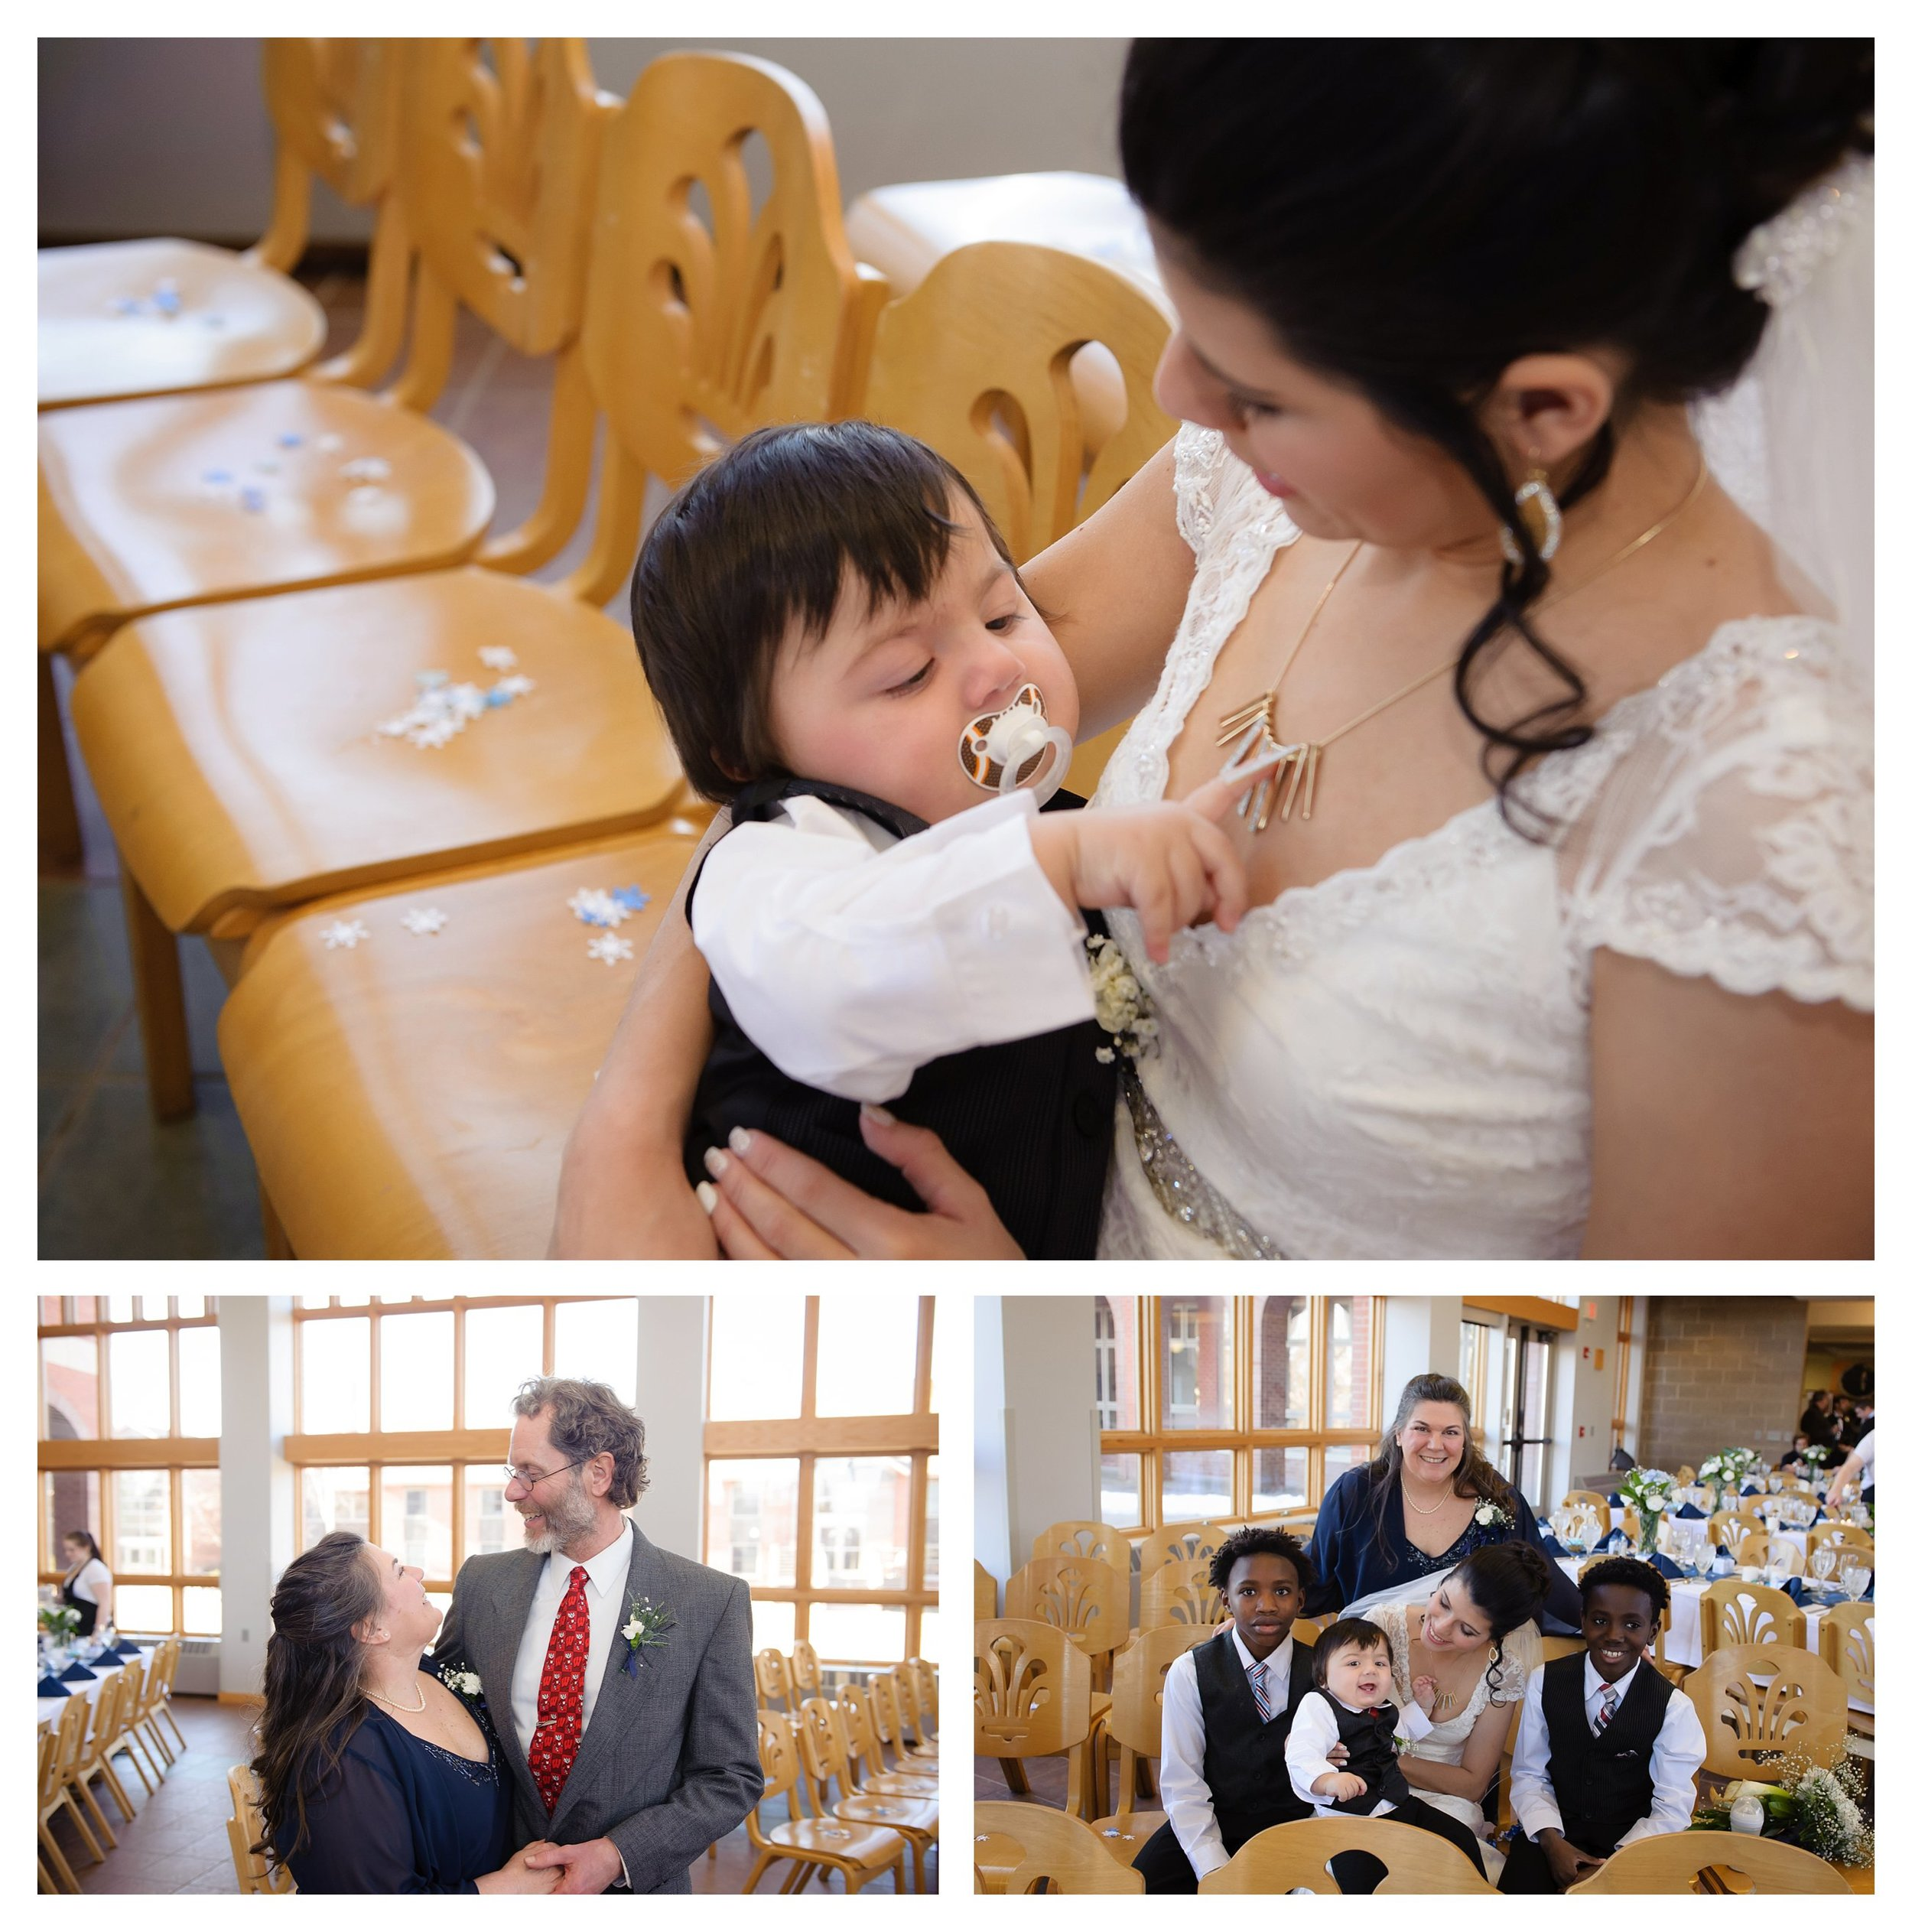 ashland wedding photographer iron river brule wisconsin ps 139 photography jen jensen_0129.jpg